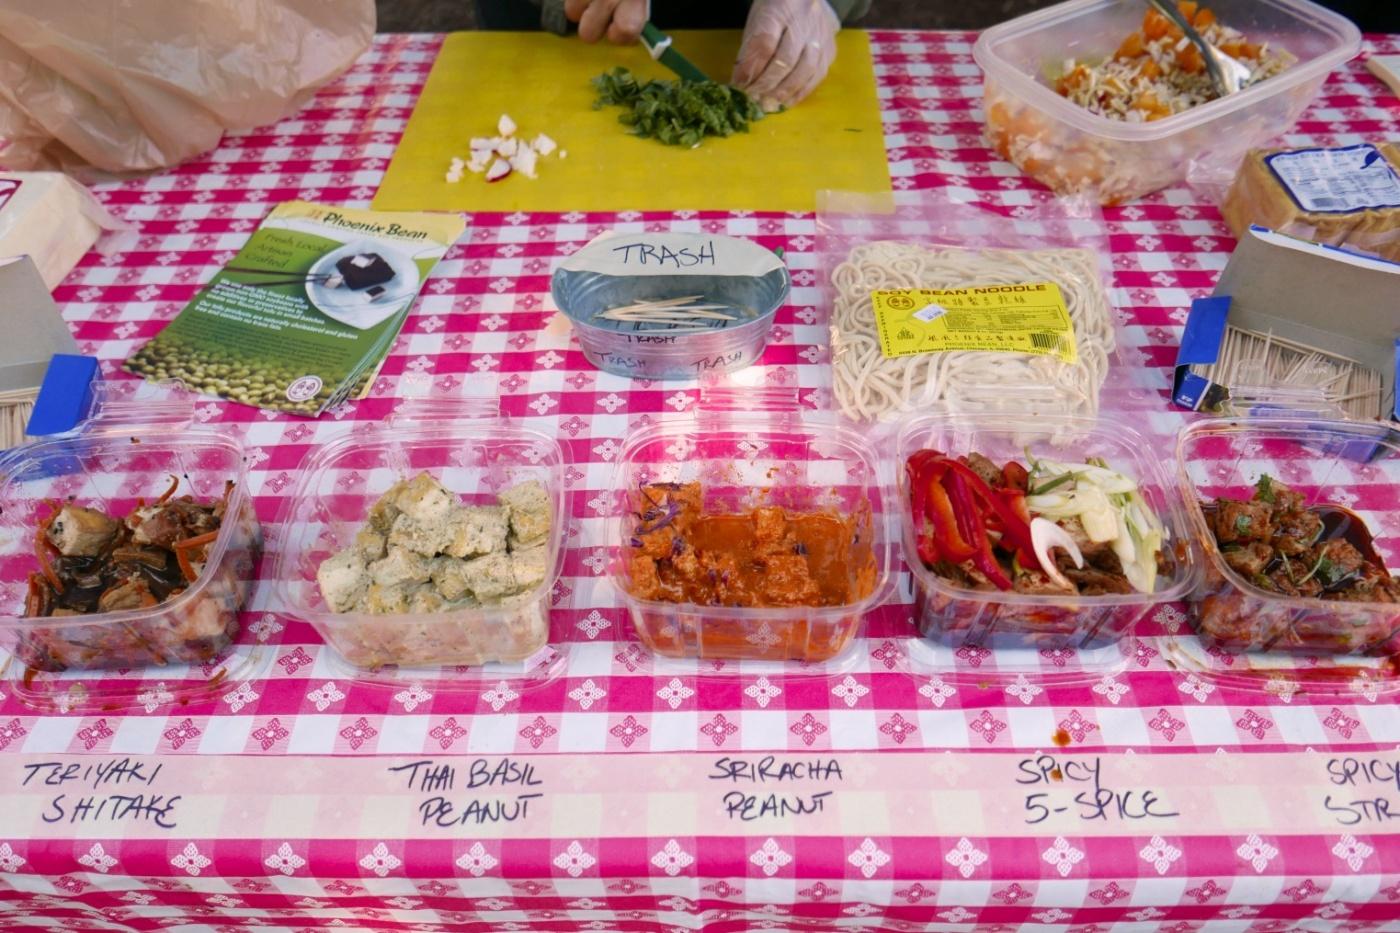 Phoenix Bean has ready-made marinated tofu salads.